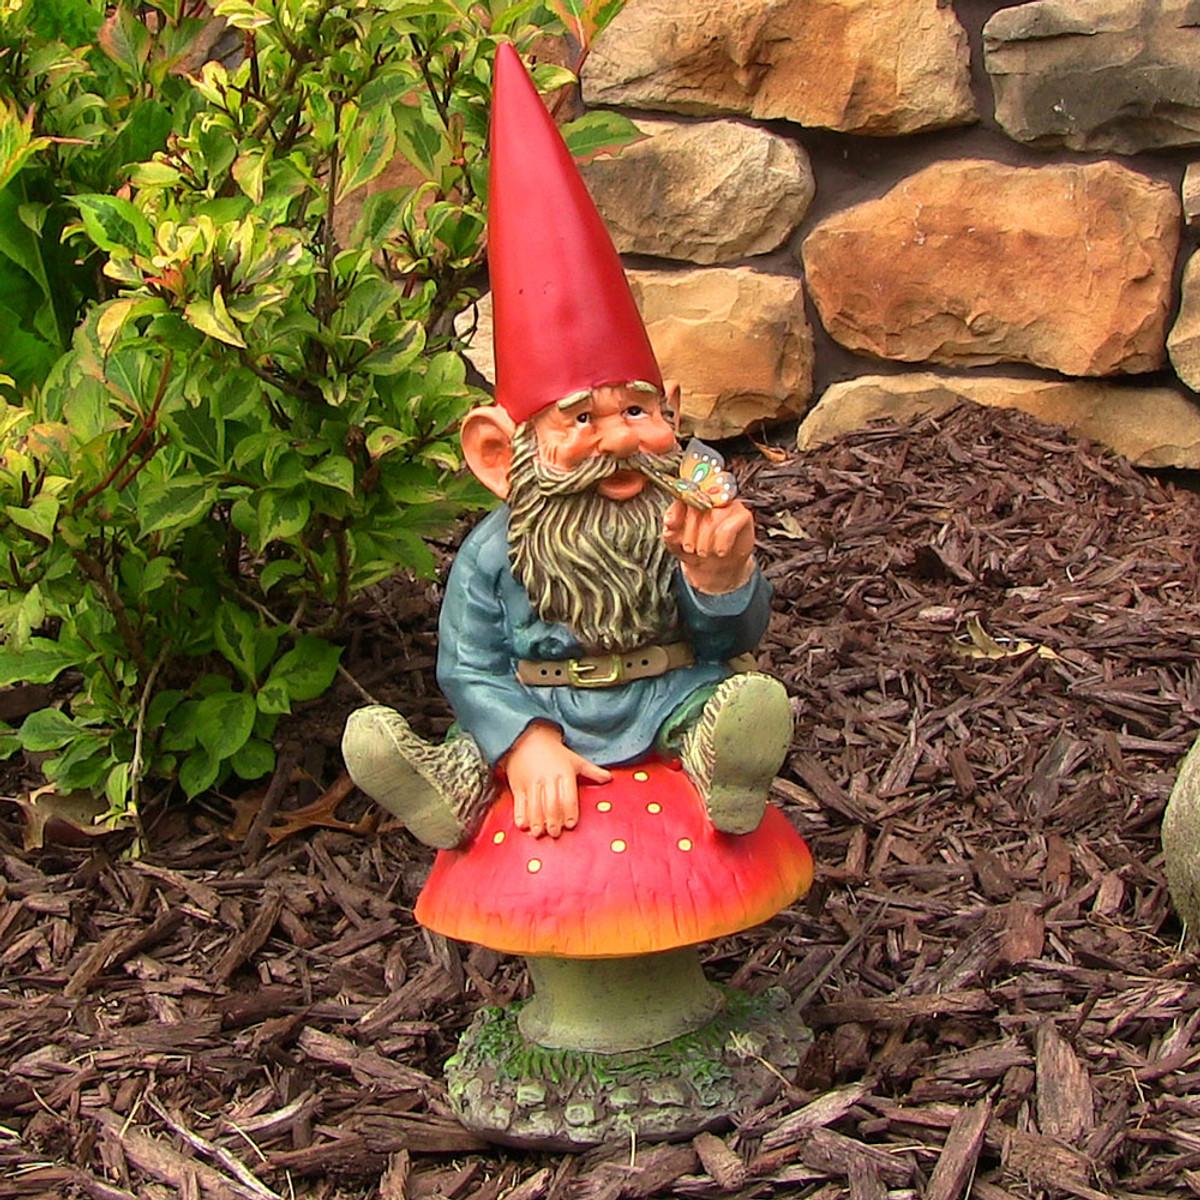 Sunnydaze Adam With Butterfly Garden Gnome 14